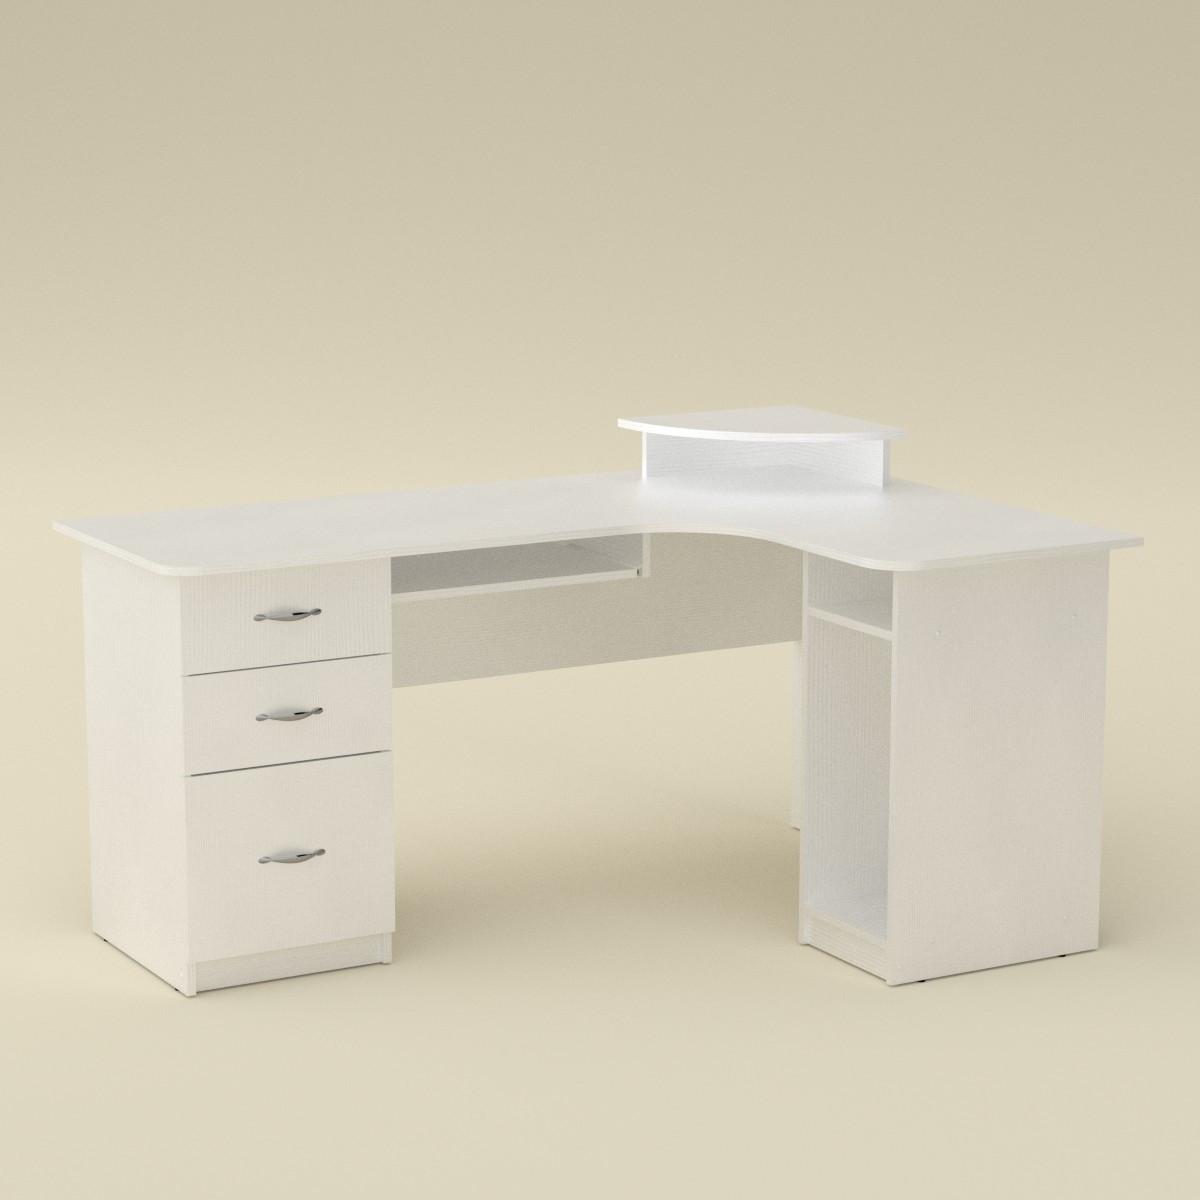 Стол компьютерный СУ-3 белый Компанит (160х110х87 см)